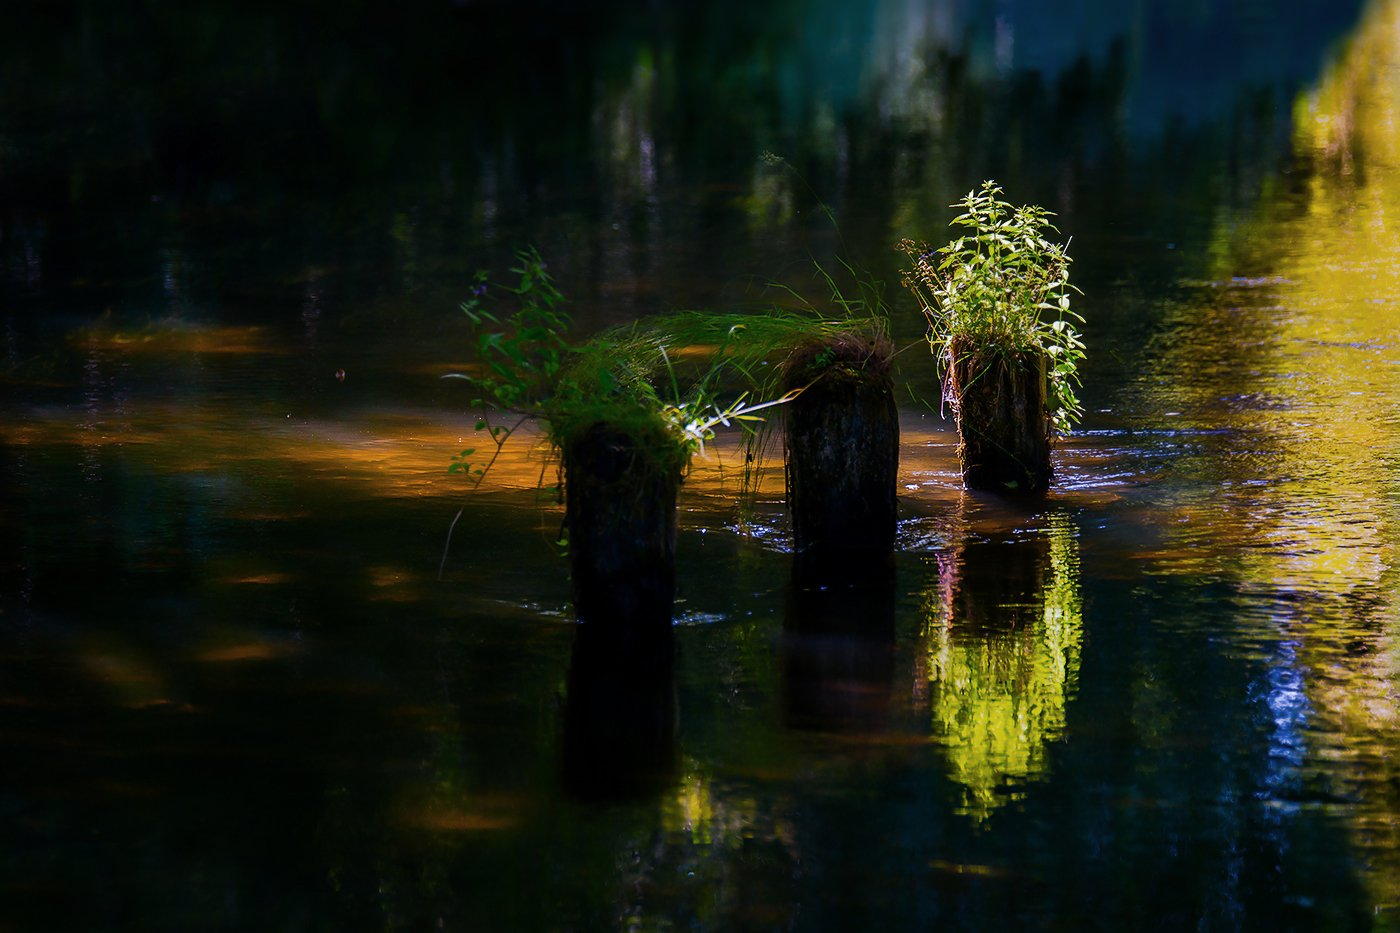 , Marian Lubawski Travel Photography